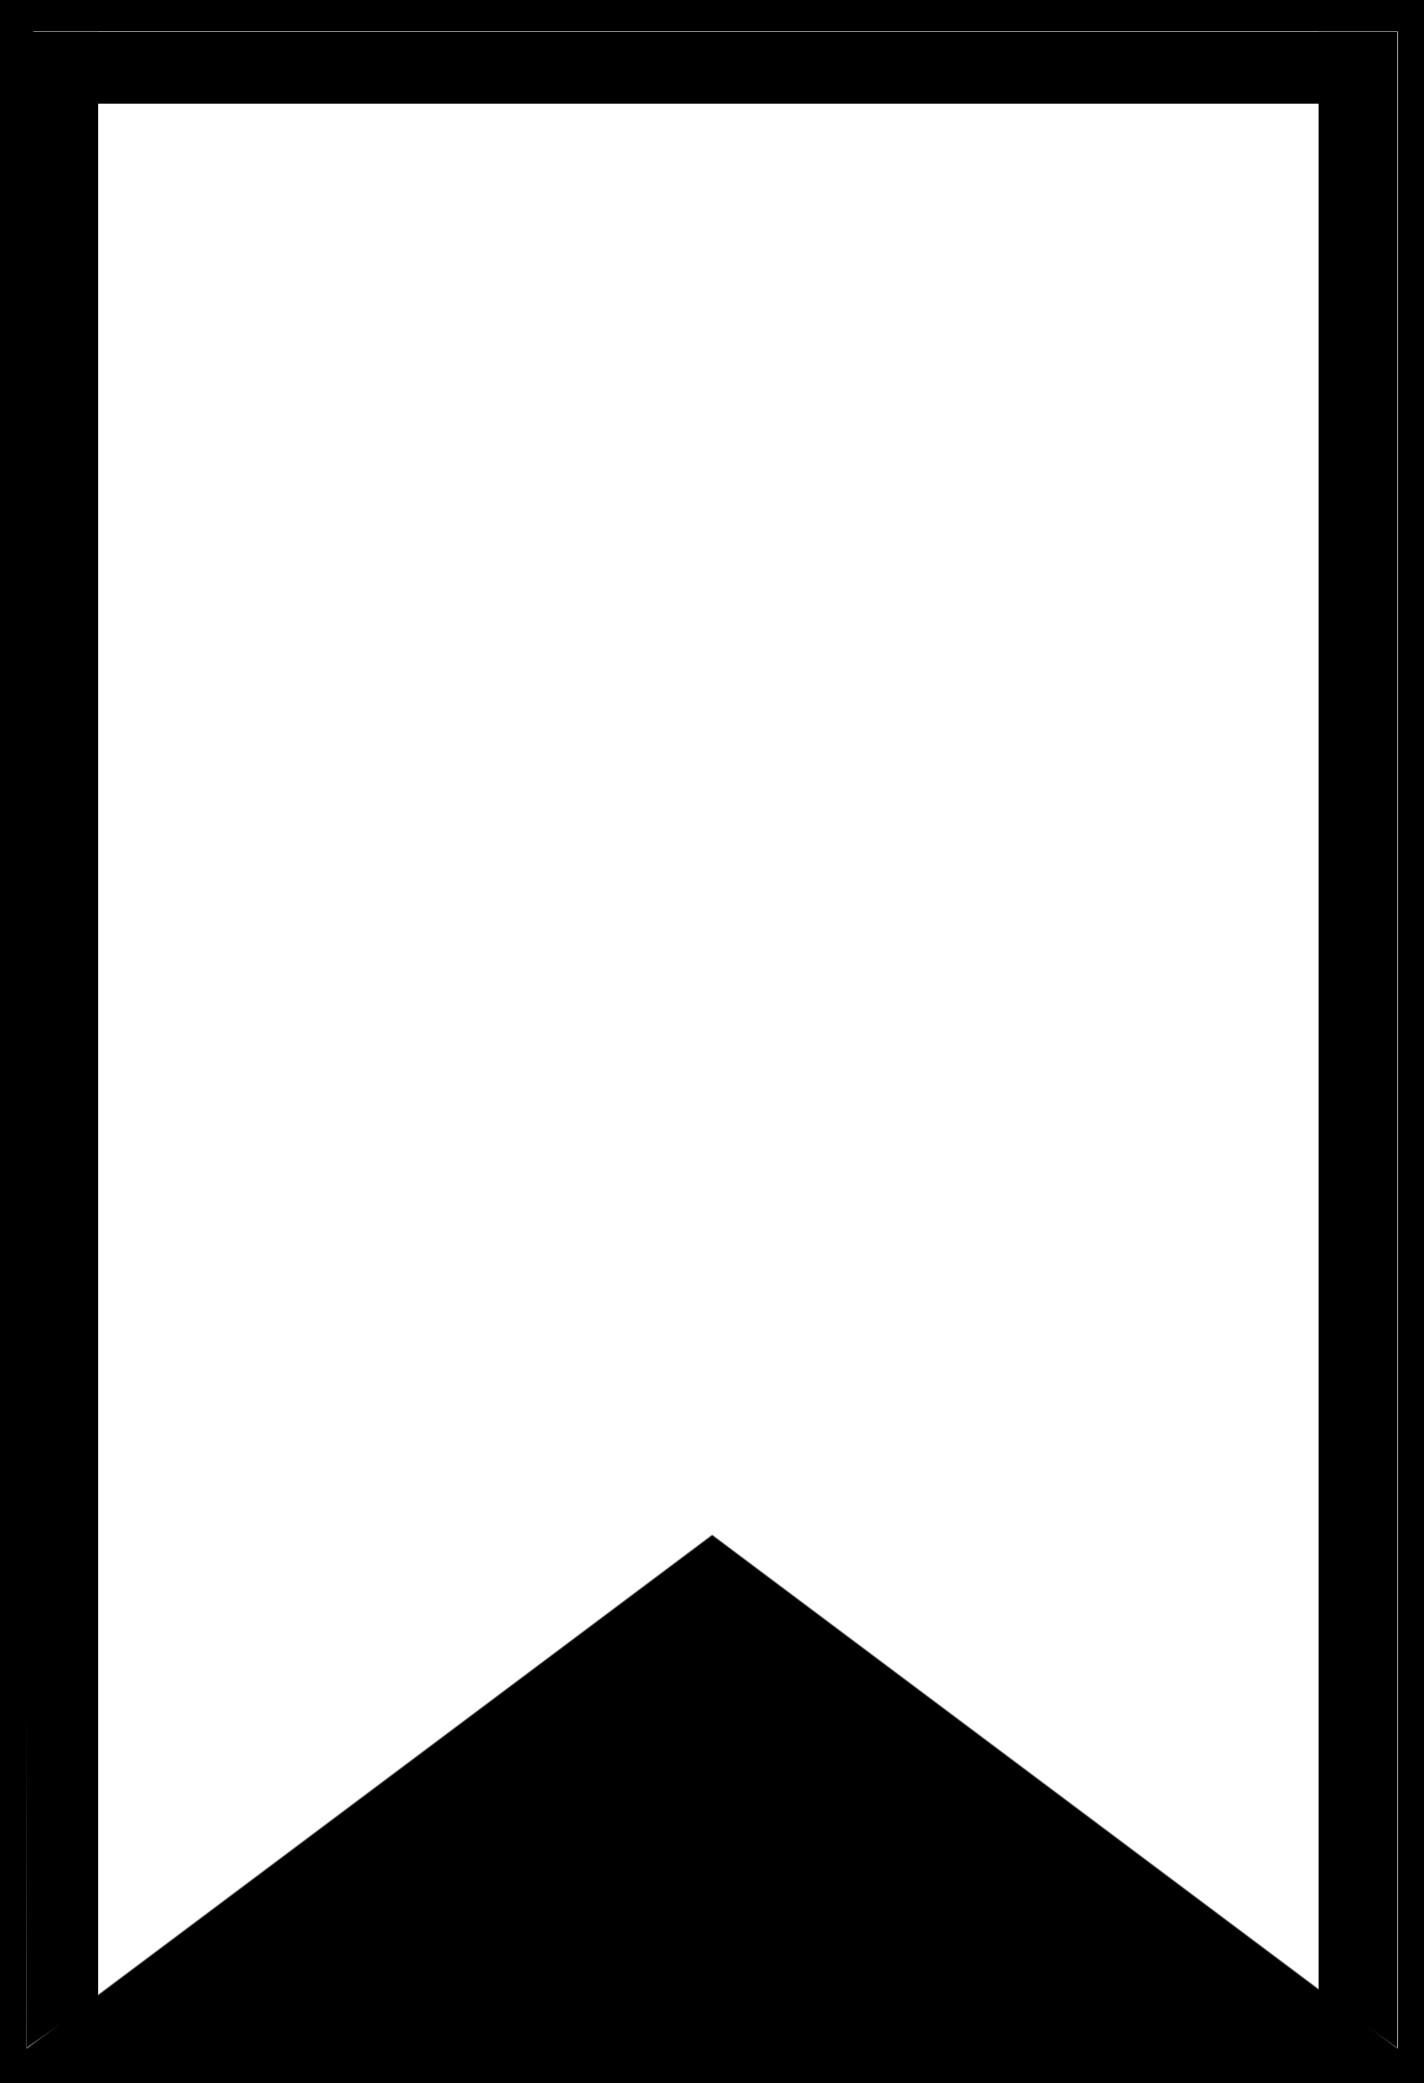 Free Printable Banner Templates Free Printable Banner Templates Blank Banners Paper